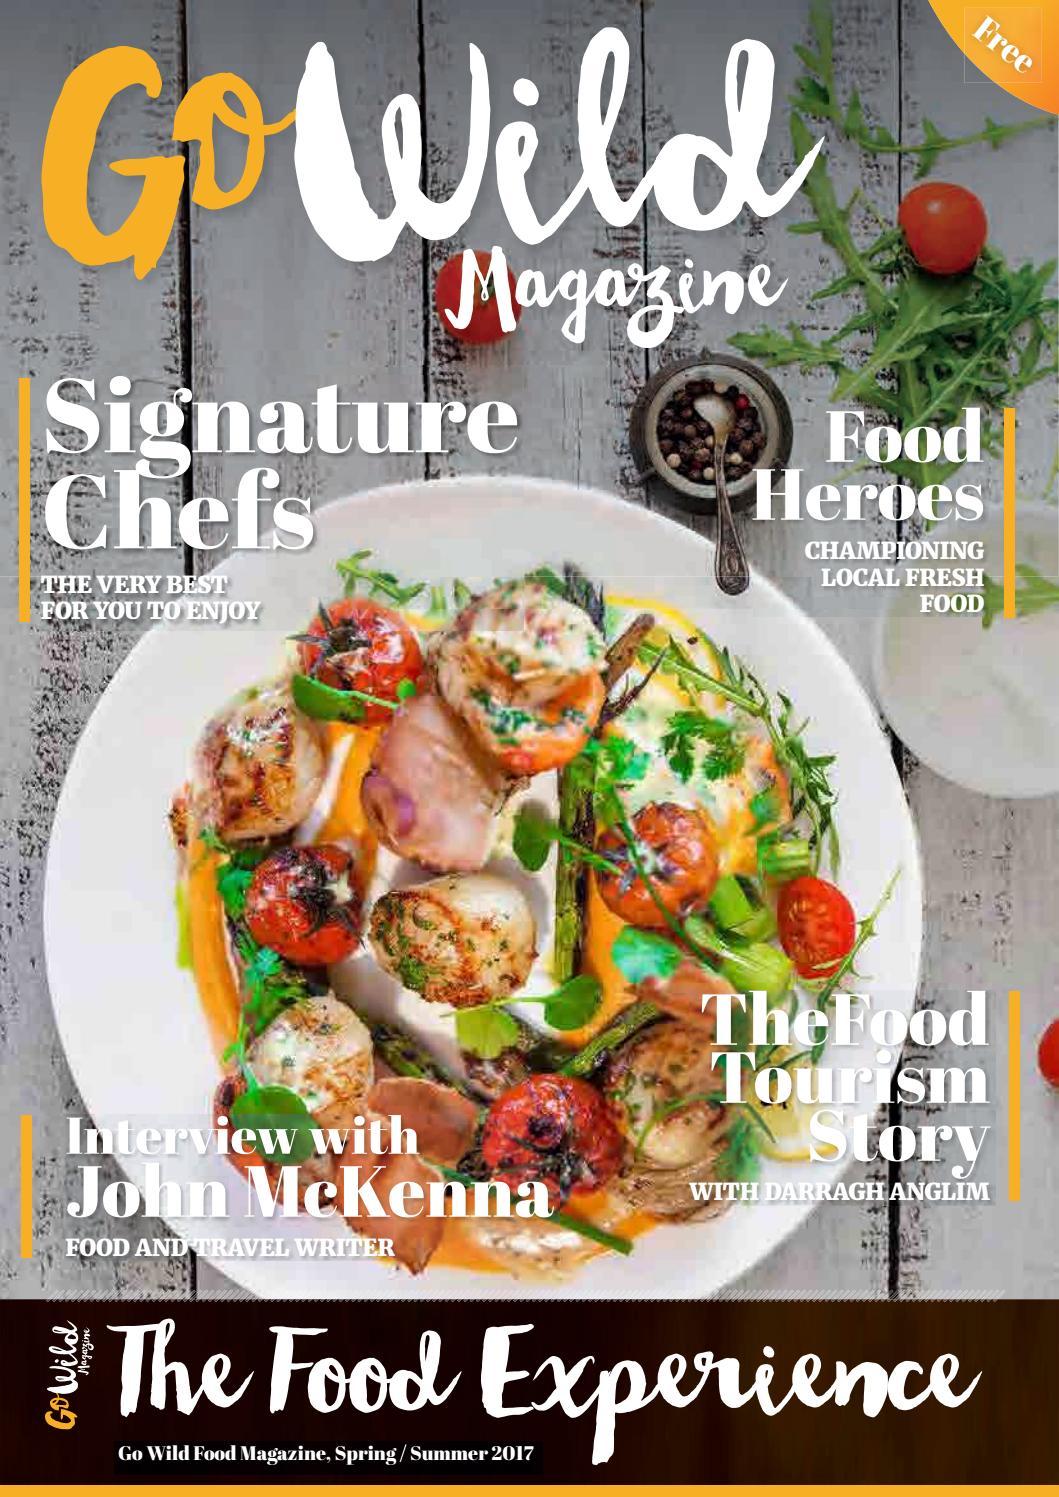 Go wild the food experience magazine 2017 by Go Wild